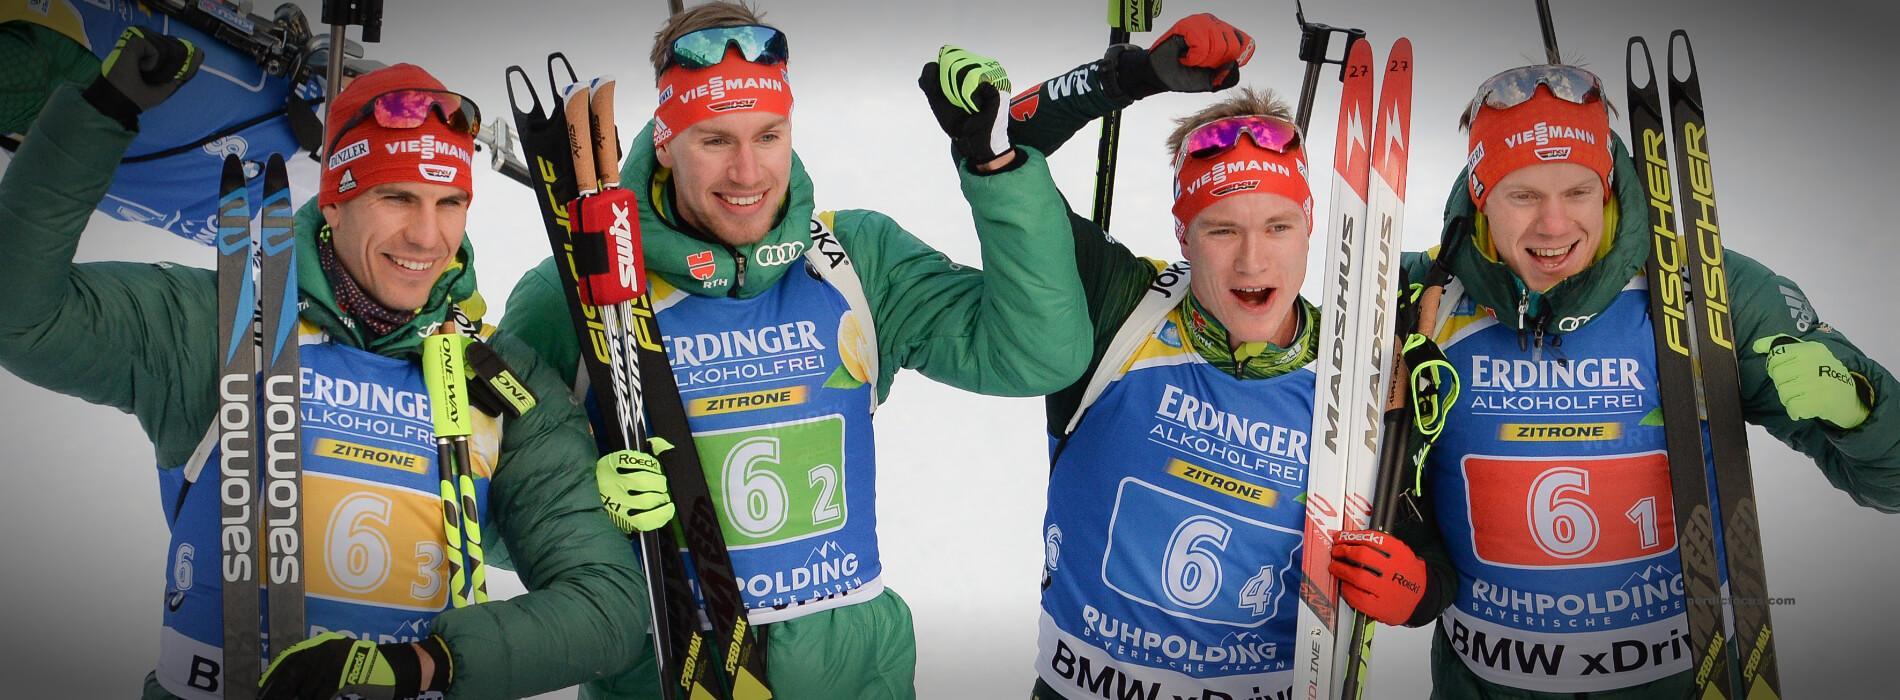 Staffel Deutschland Herren Ruhpolding 2019